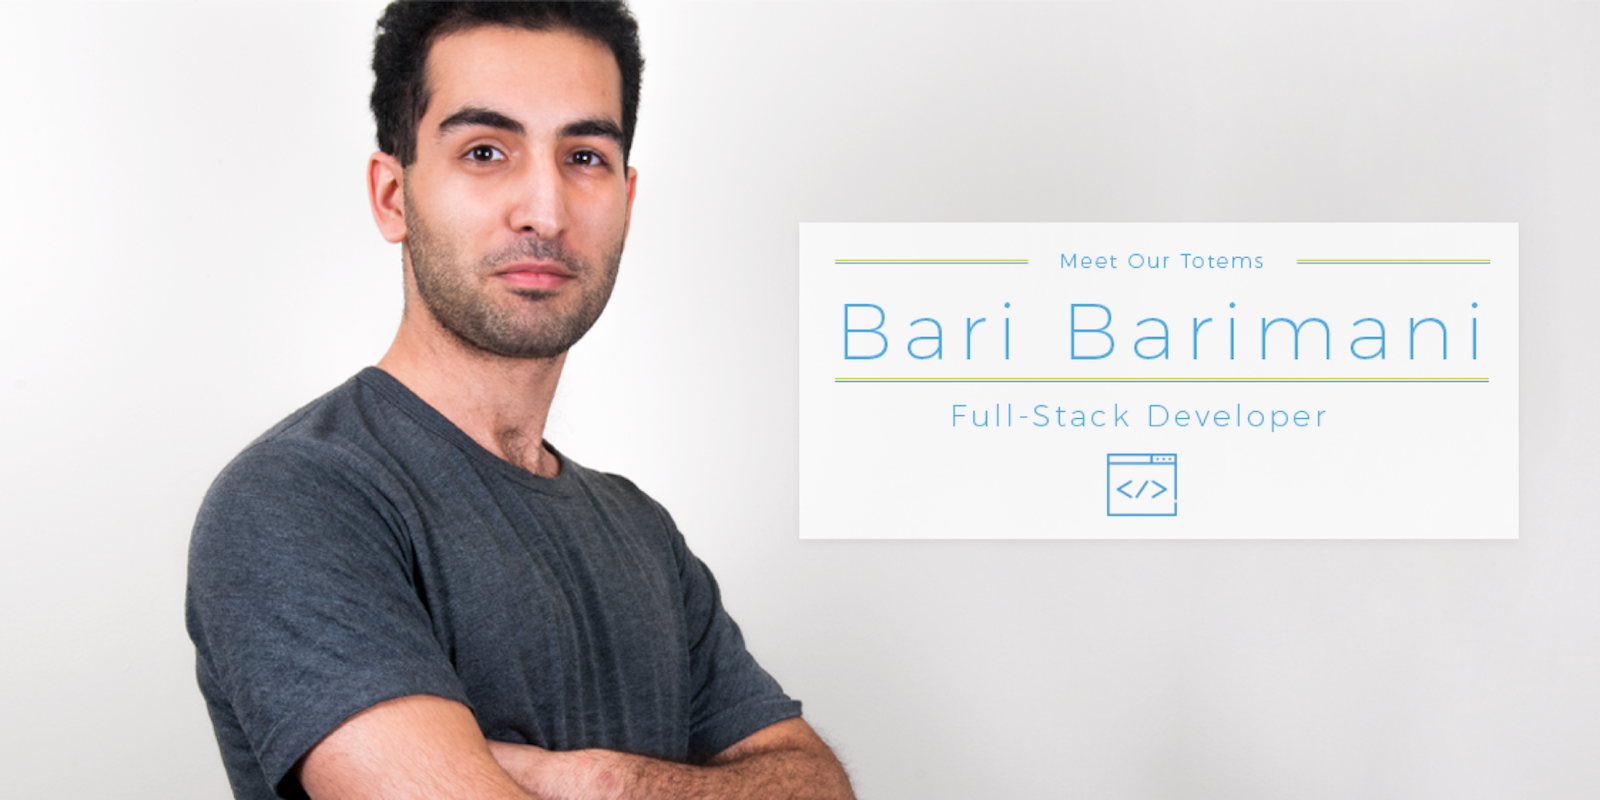 Meet Our Totems – Bari